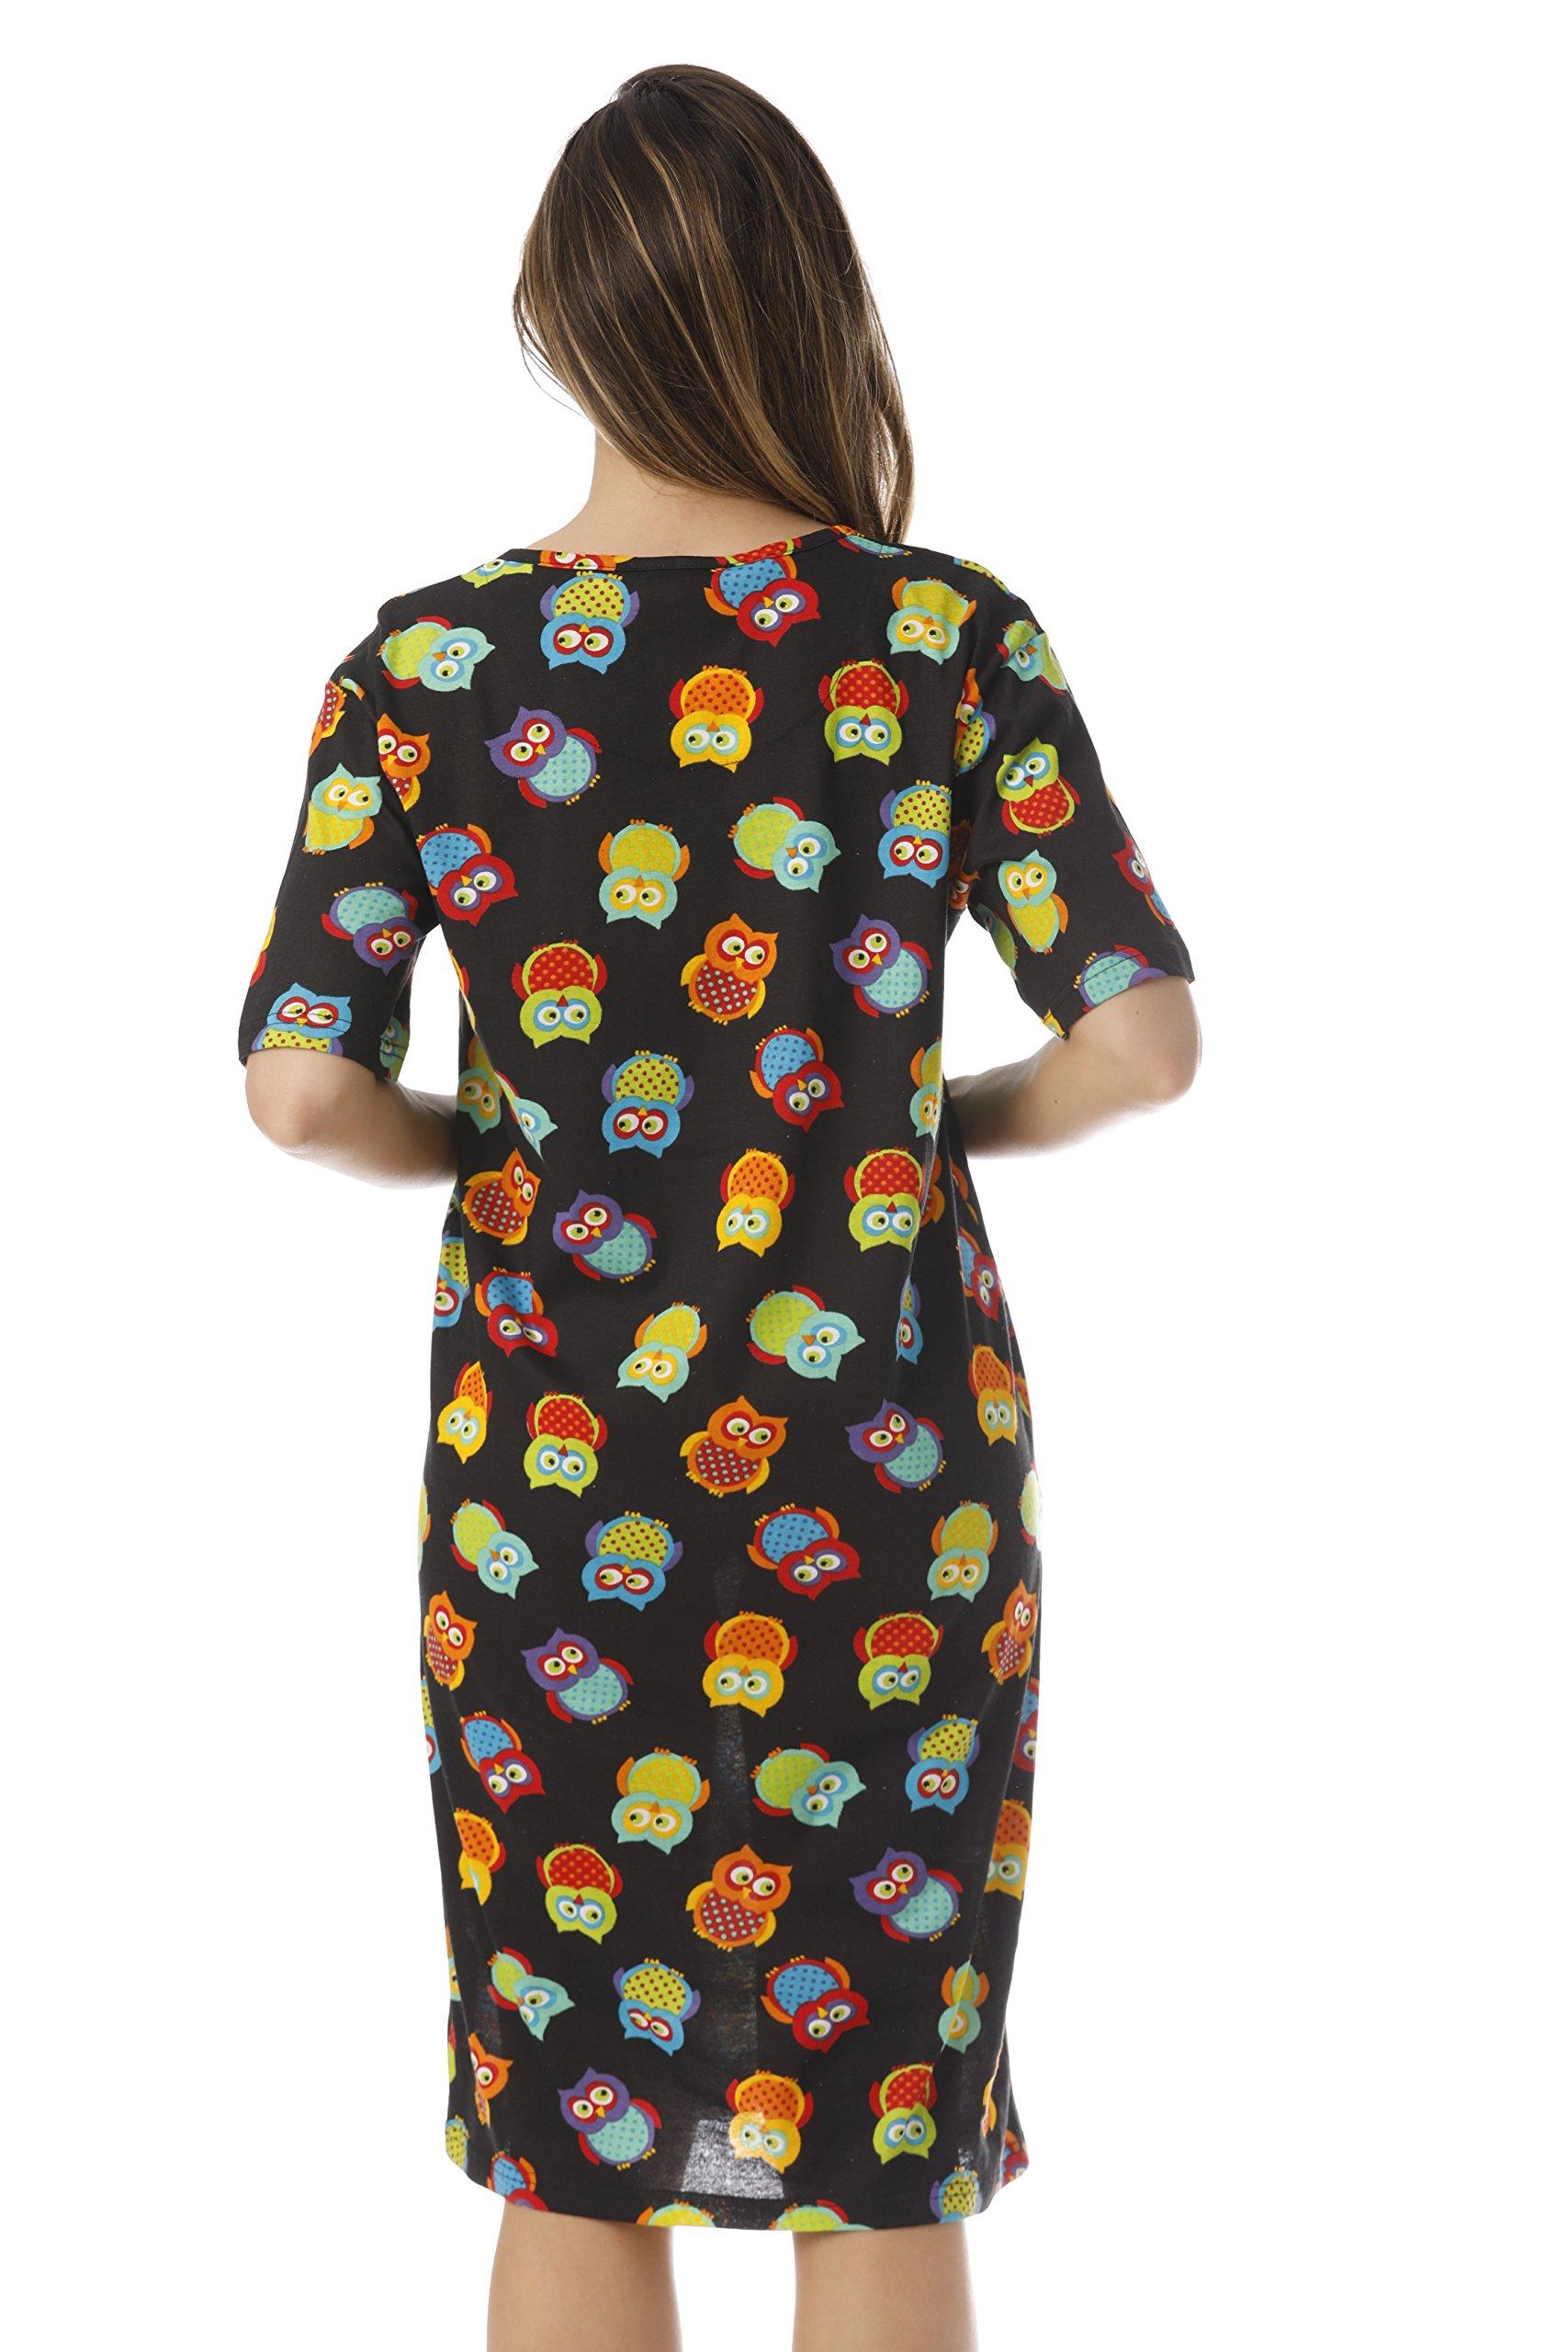 Just Love Short Sleeve Nightgown Sleep Dress for Women Sleepwear 4360-10292-3X by Just Love (Image #3)